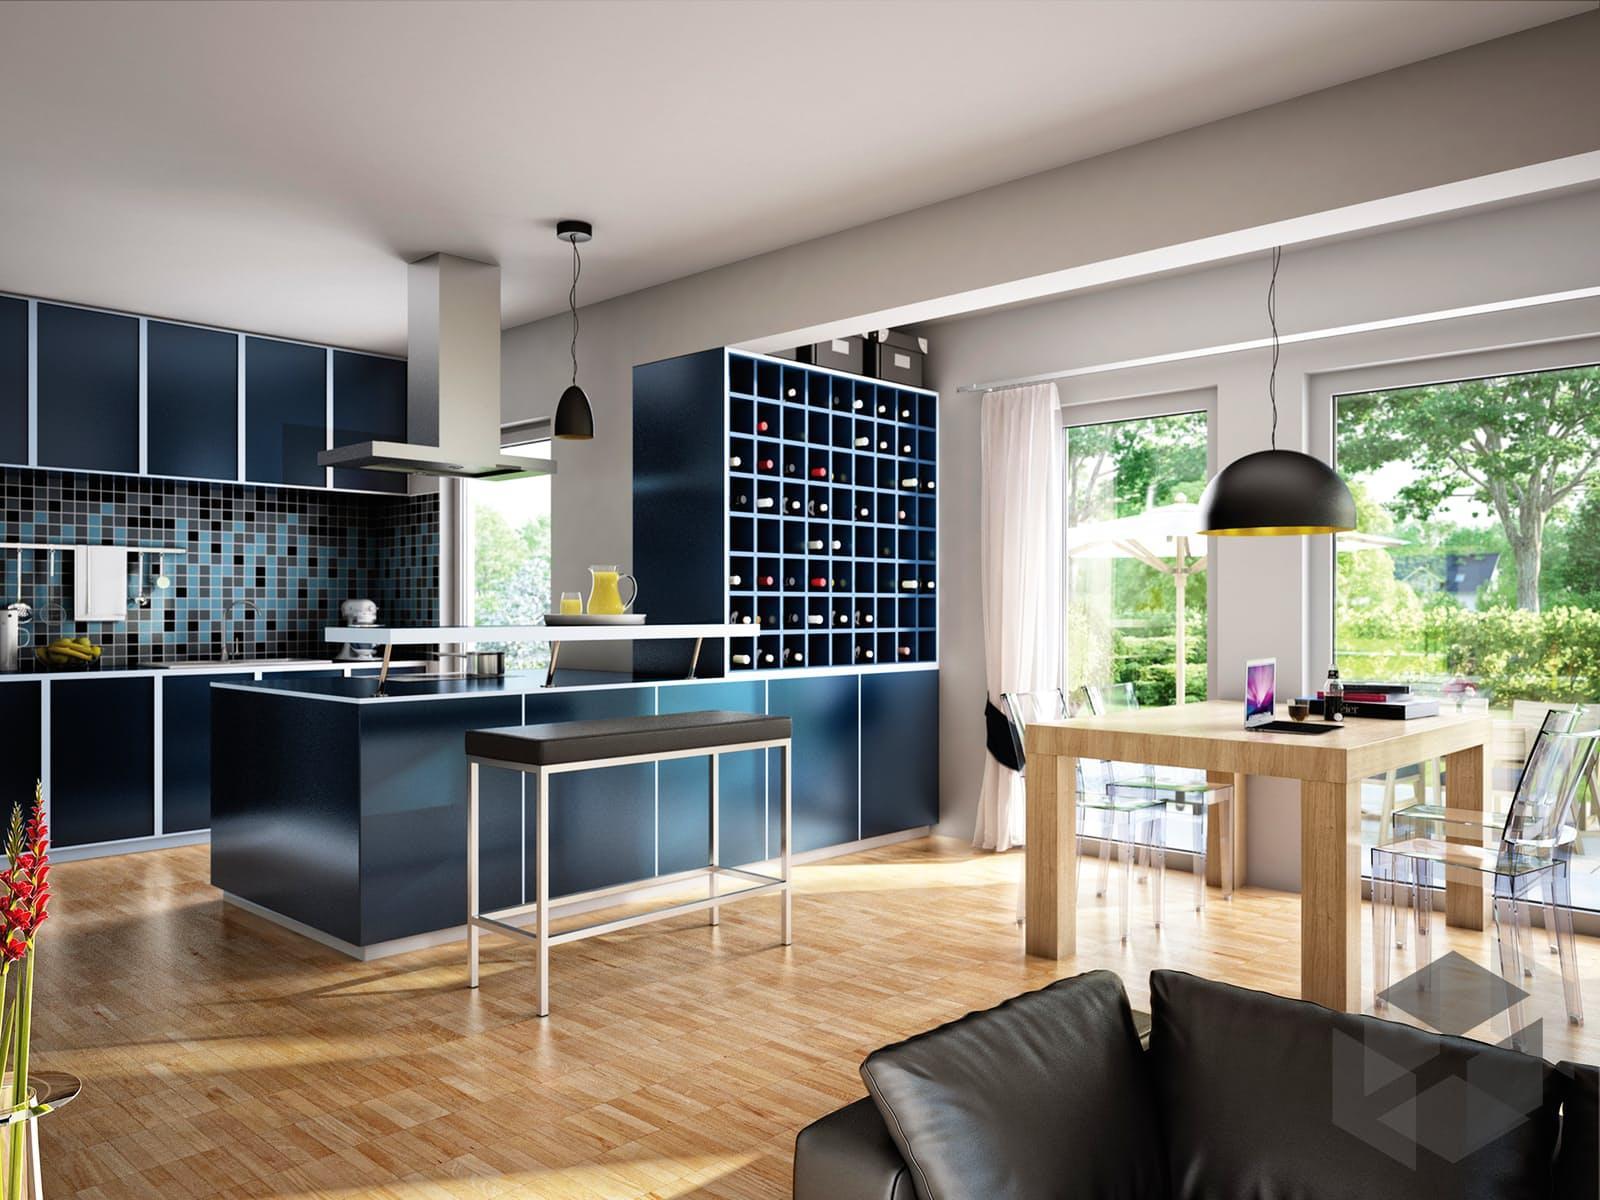 solution 106 v8 von living haus komplette daten bersicht. Black Bedroom Furniture Sets. Home Design Ideas